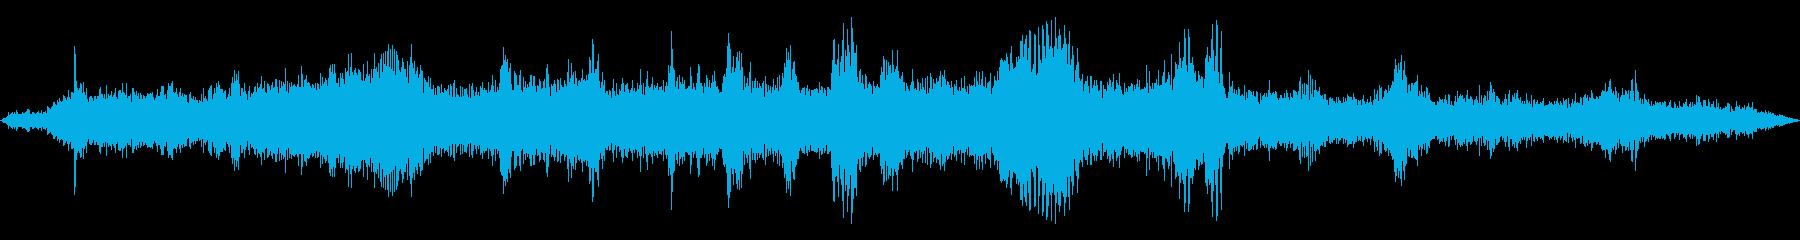 INT:加速、高速運転、減速、揺れ...の再生済みの波形